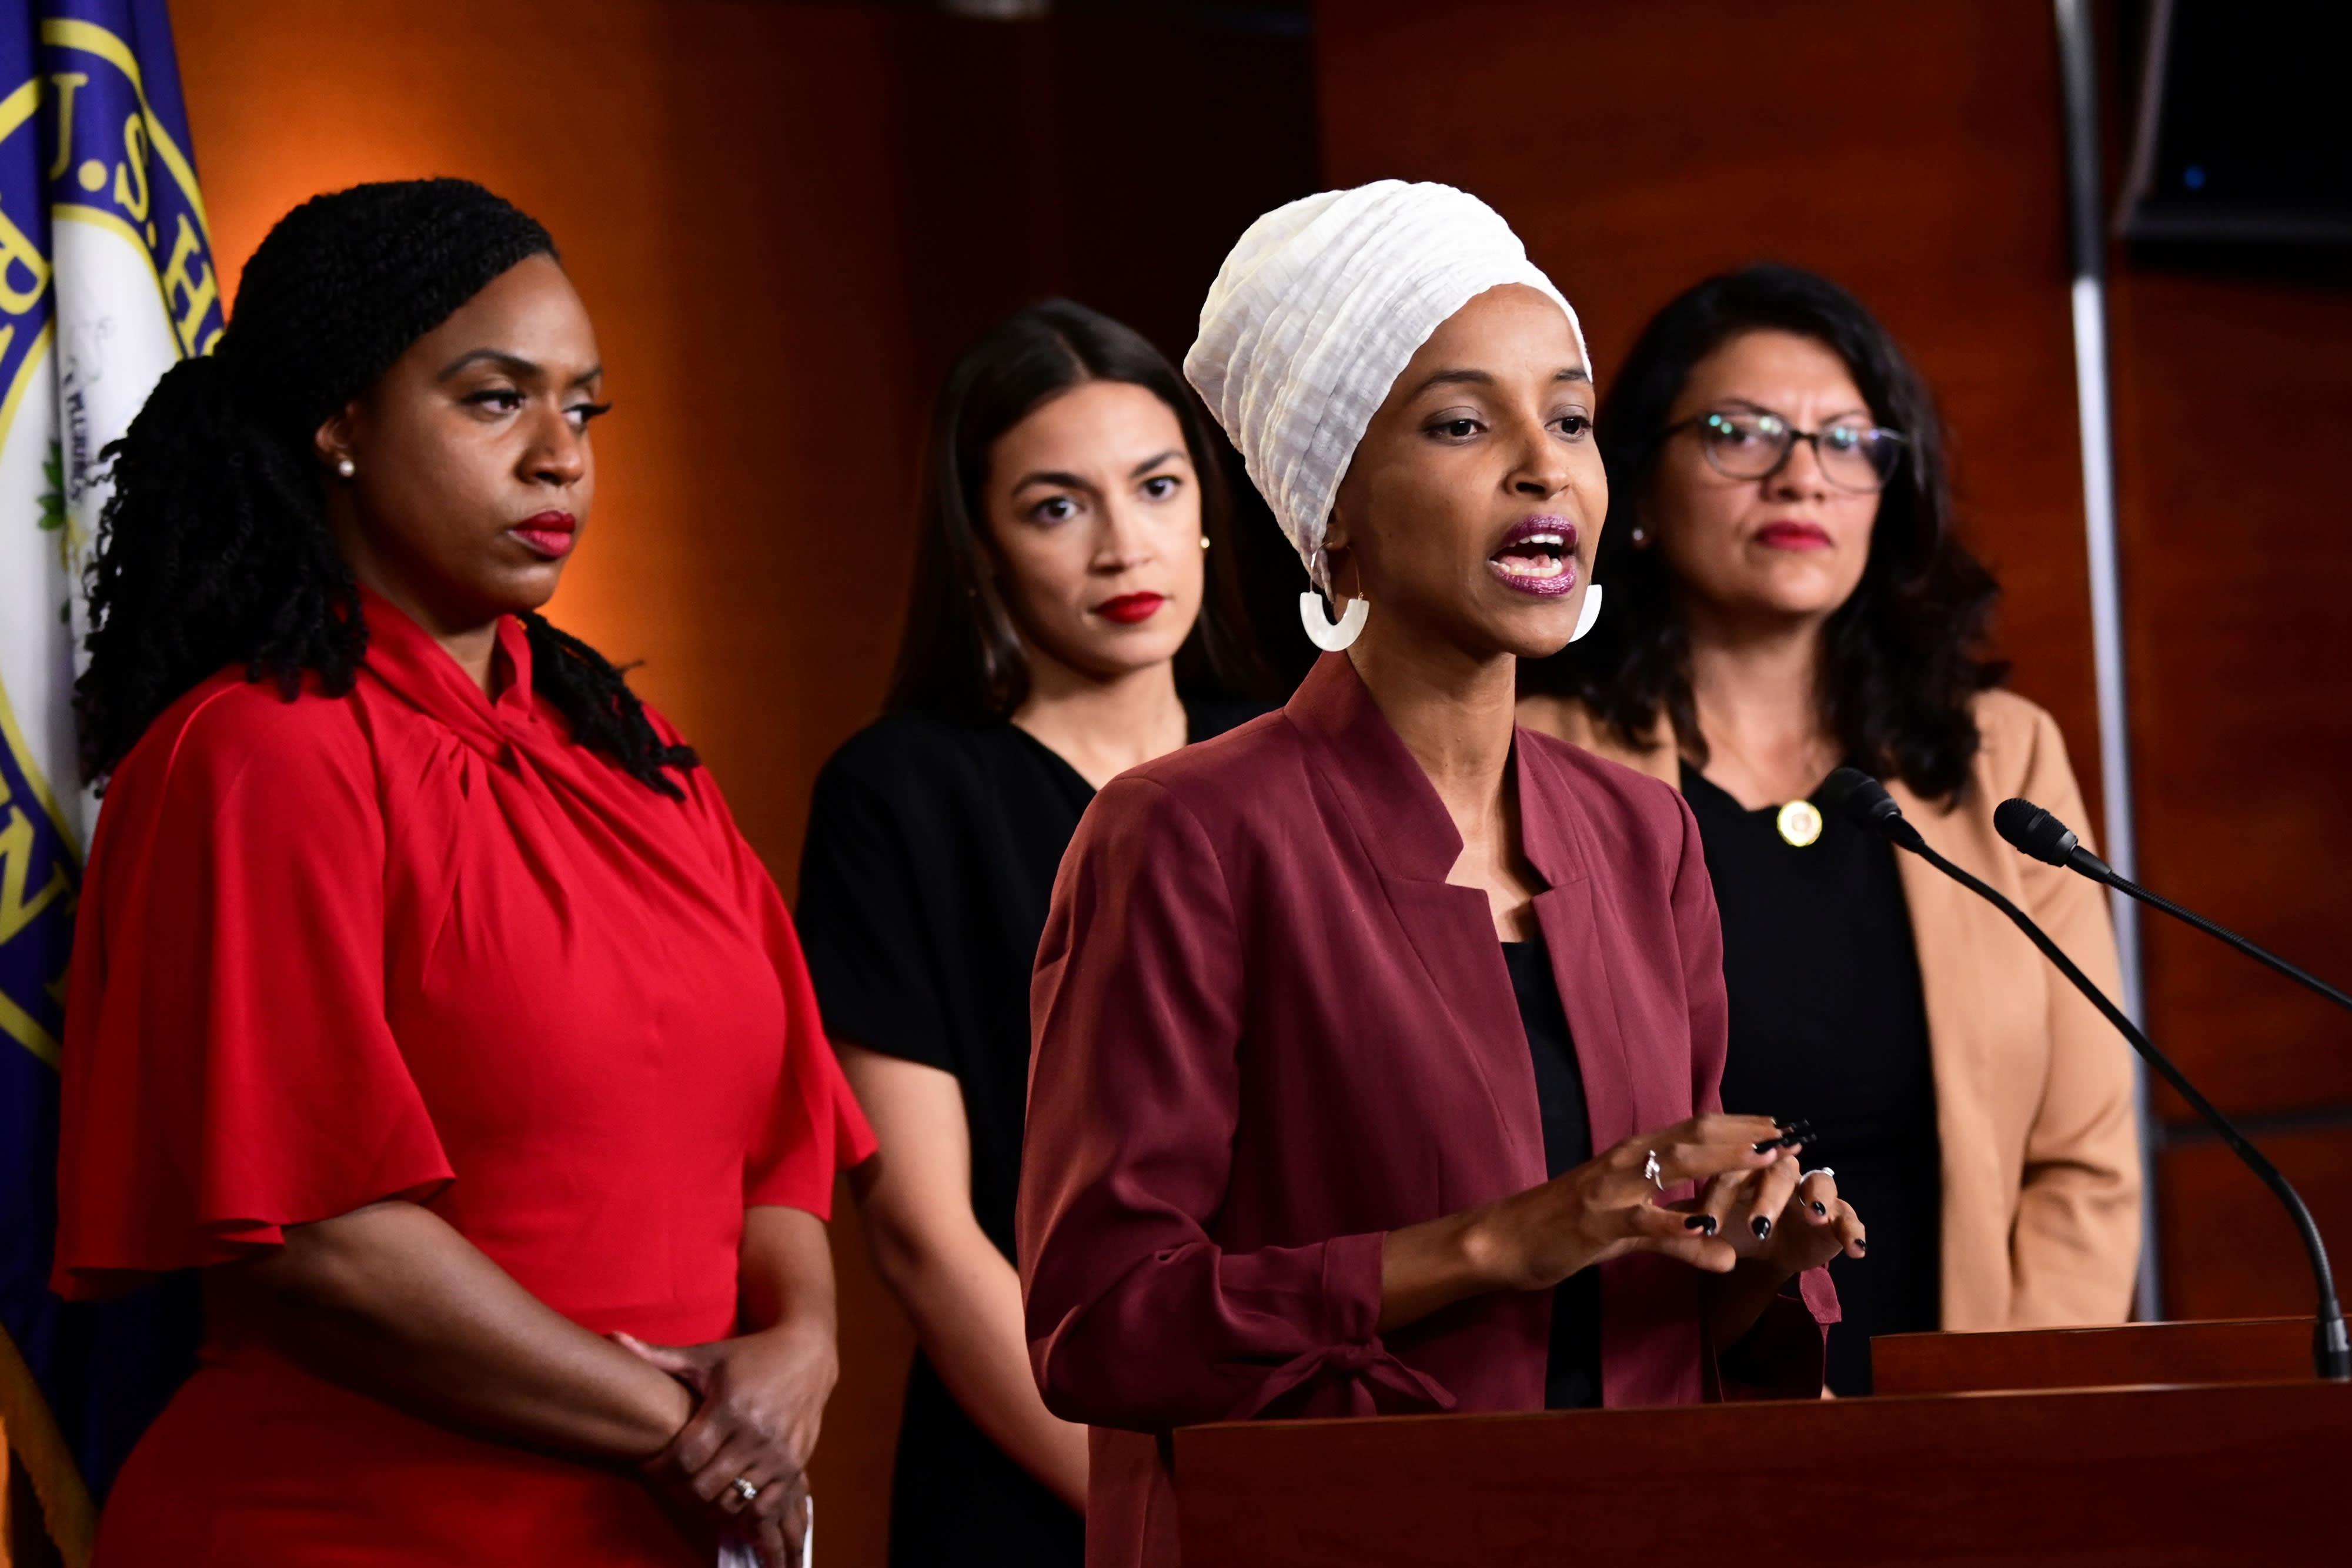 House Democrats vote to condemn Trump's attacks on congresswomen as racist